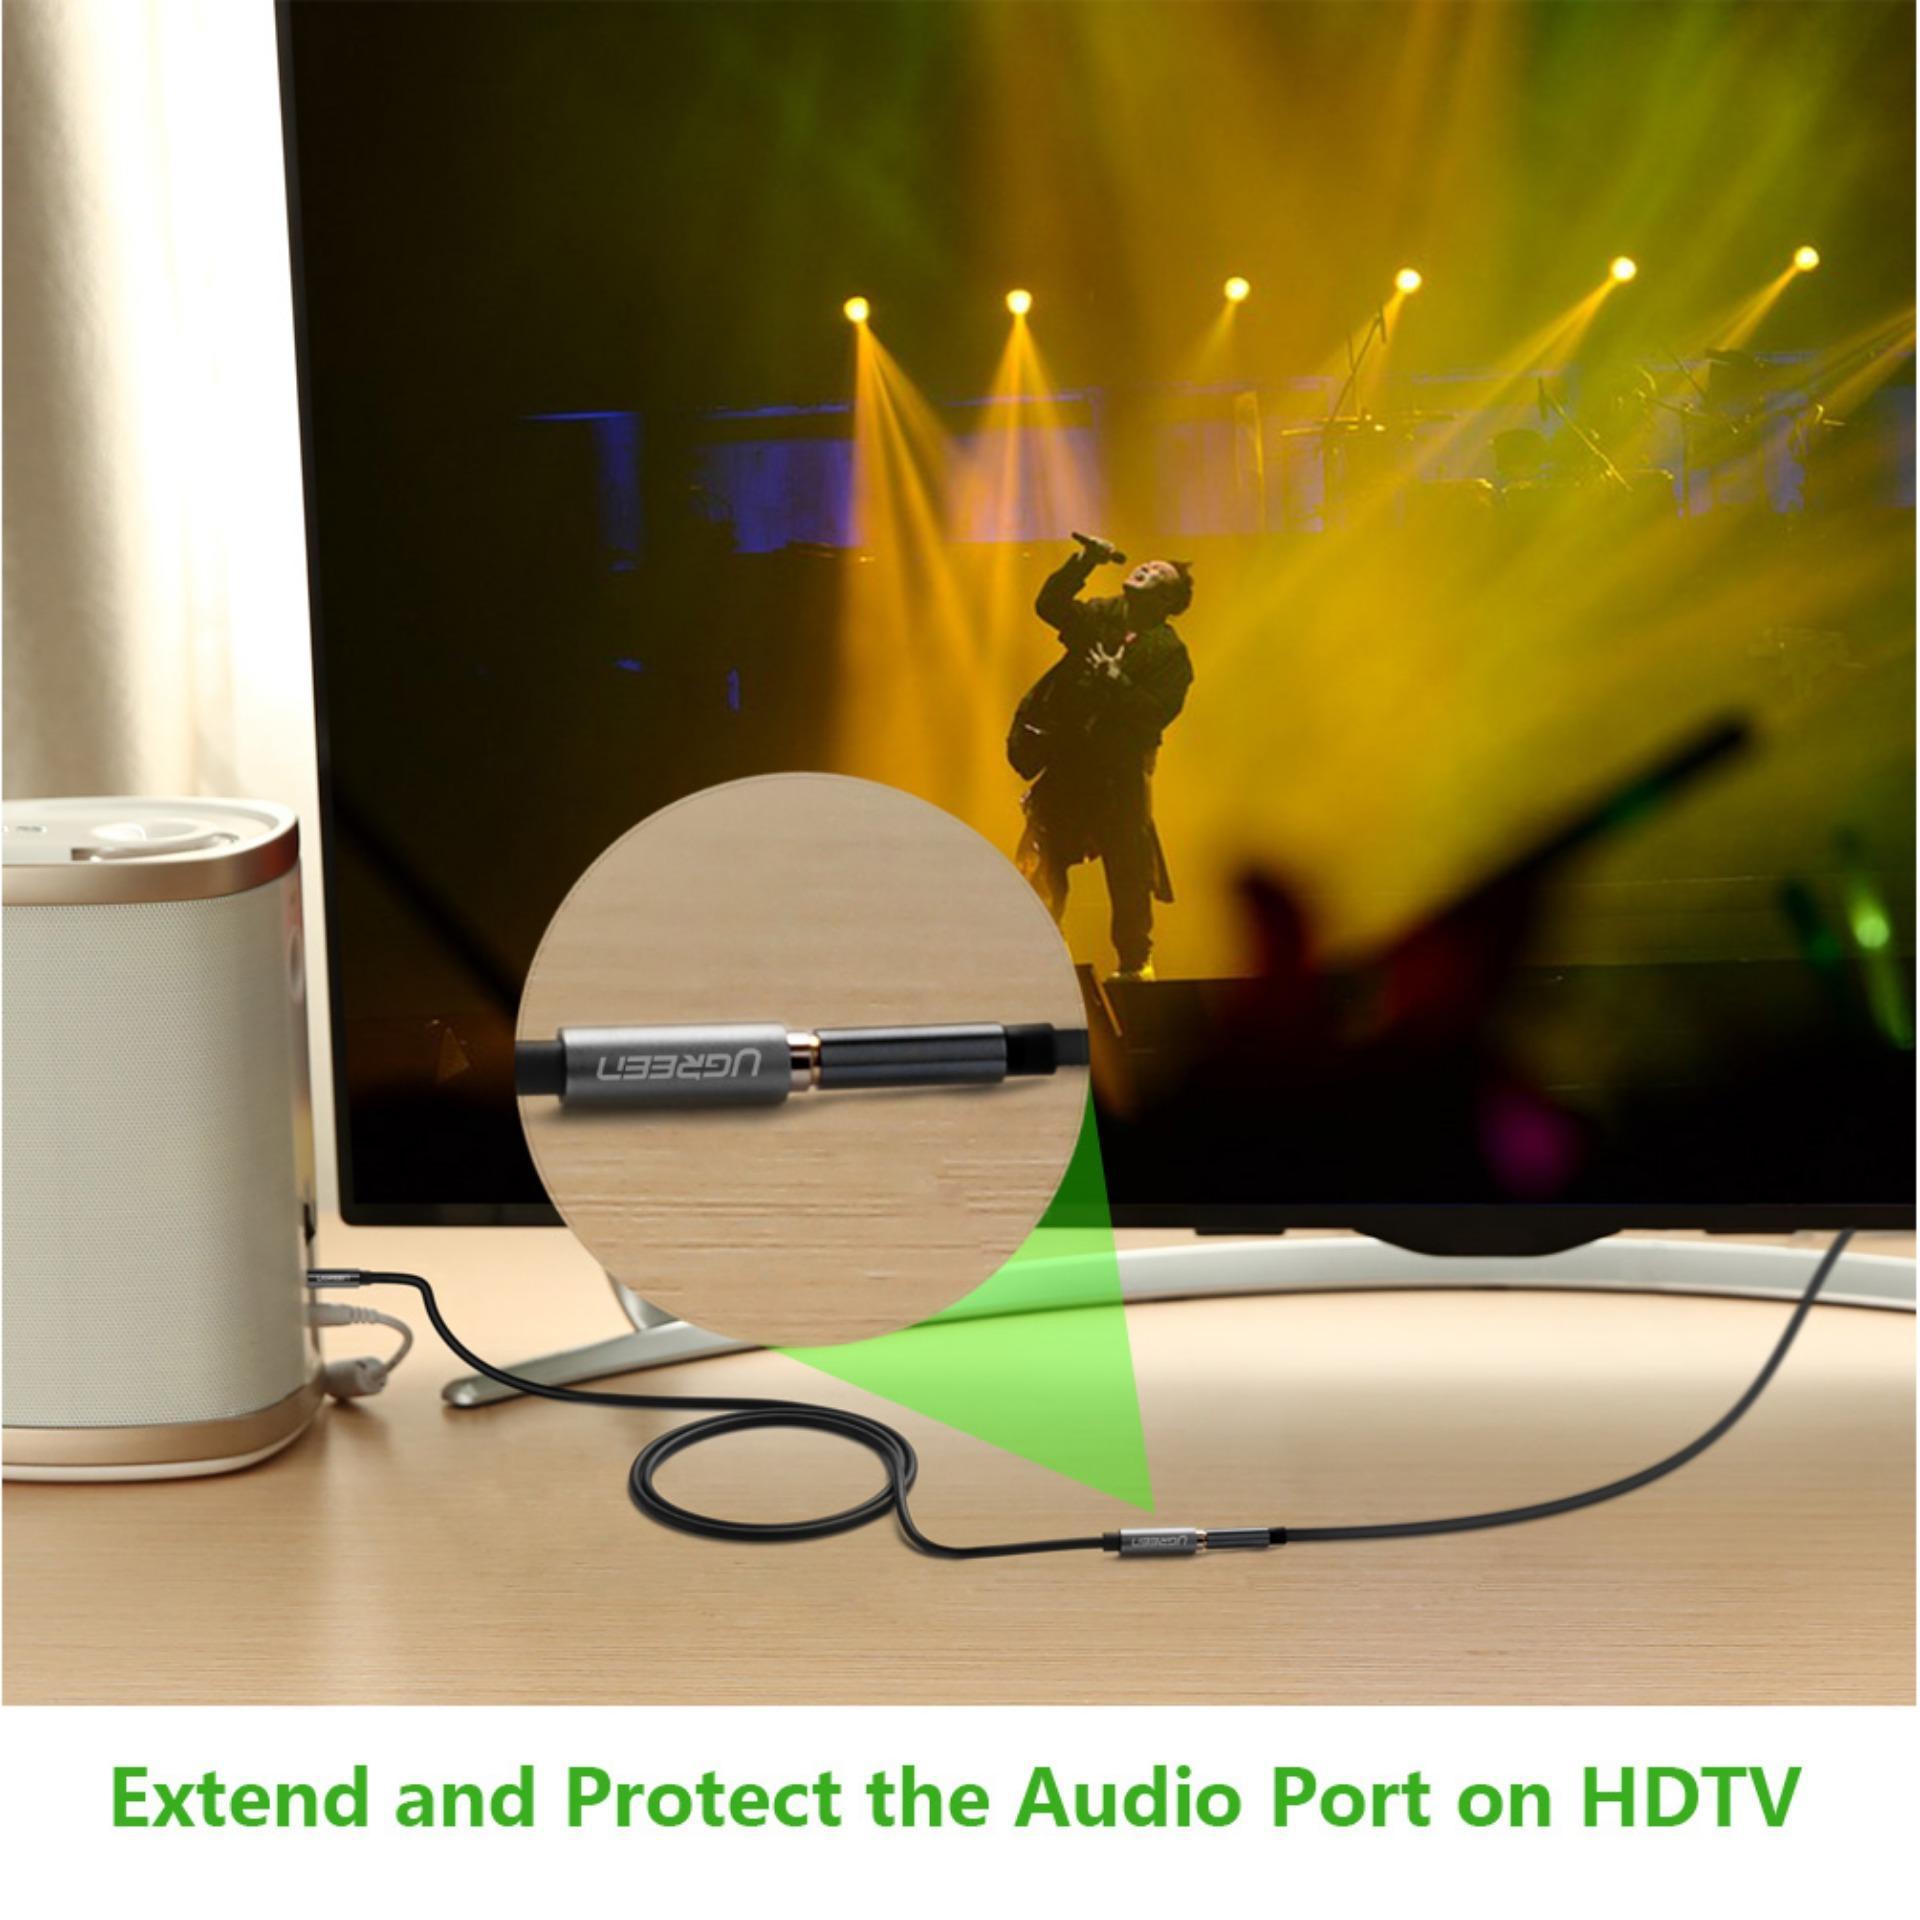 ... UGREEN 3,5 mm Stereo Audio Jack kabel ekstensi dengan Case aluminium (2 m ...